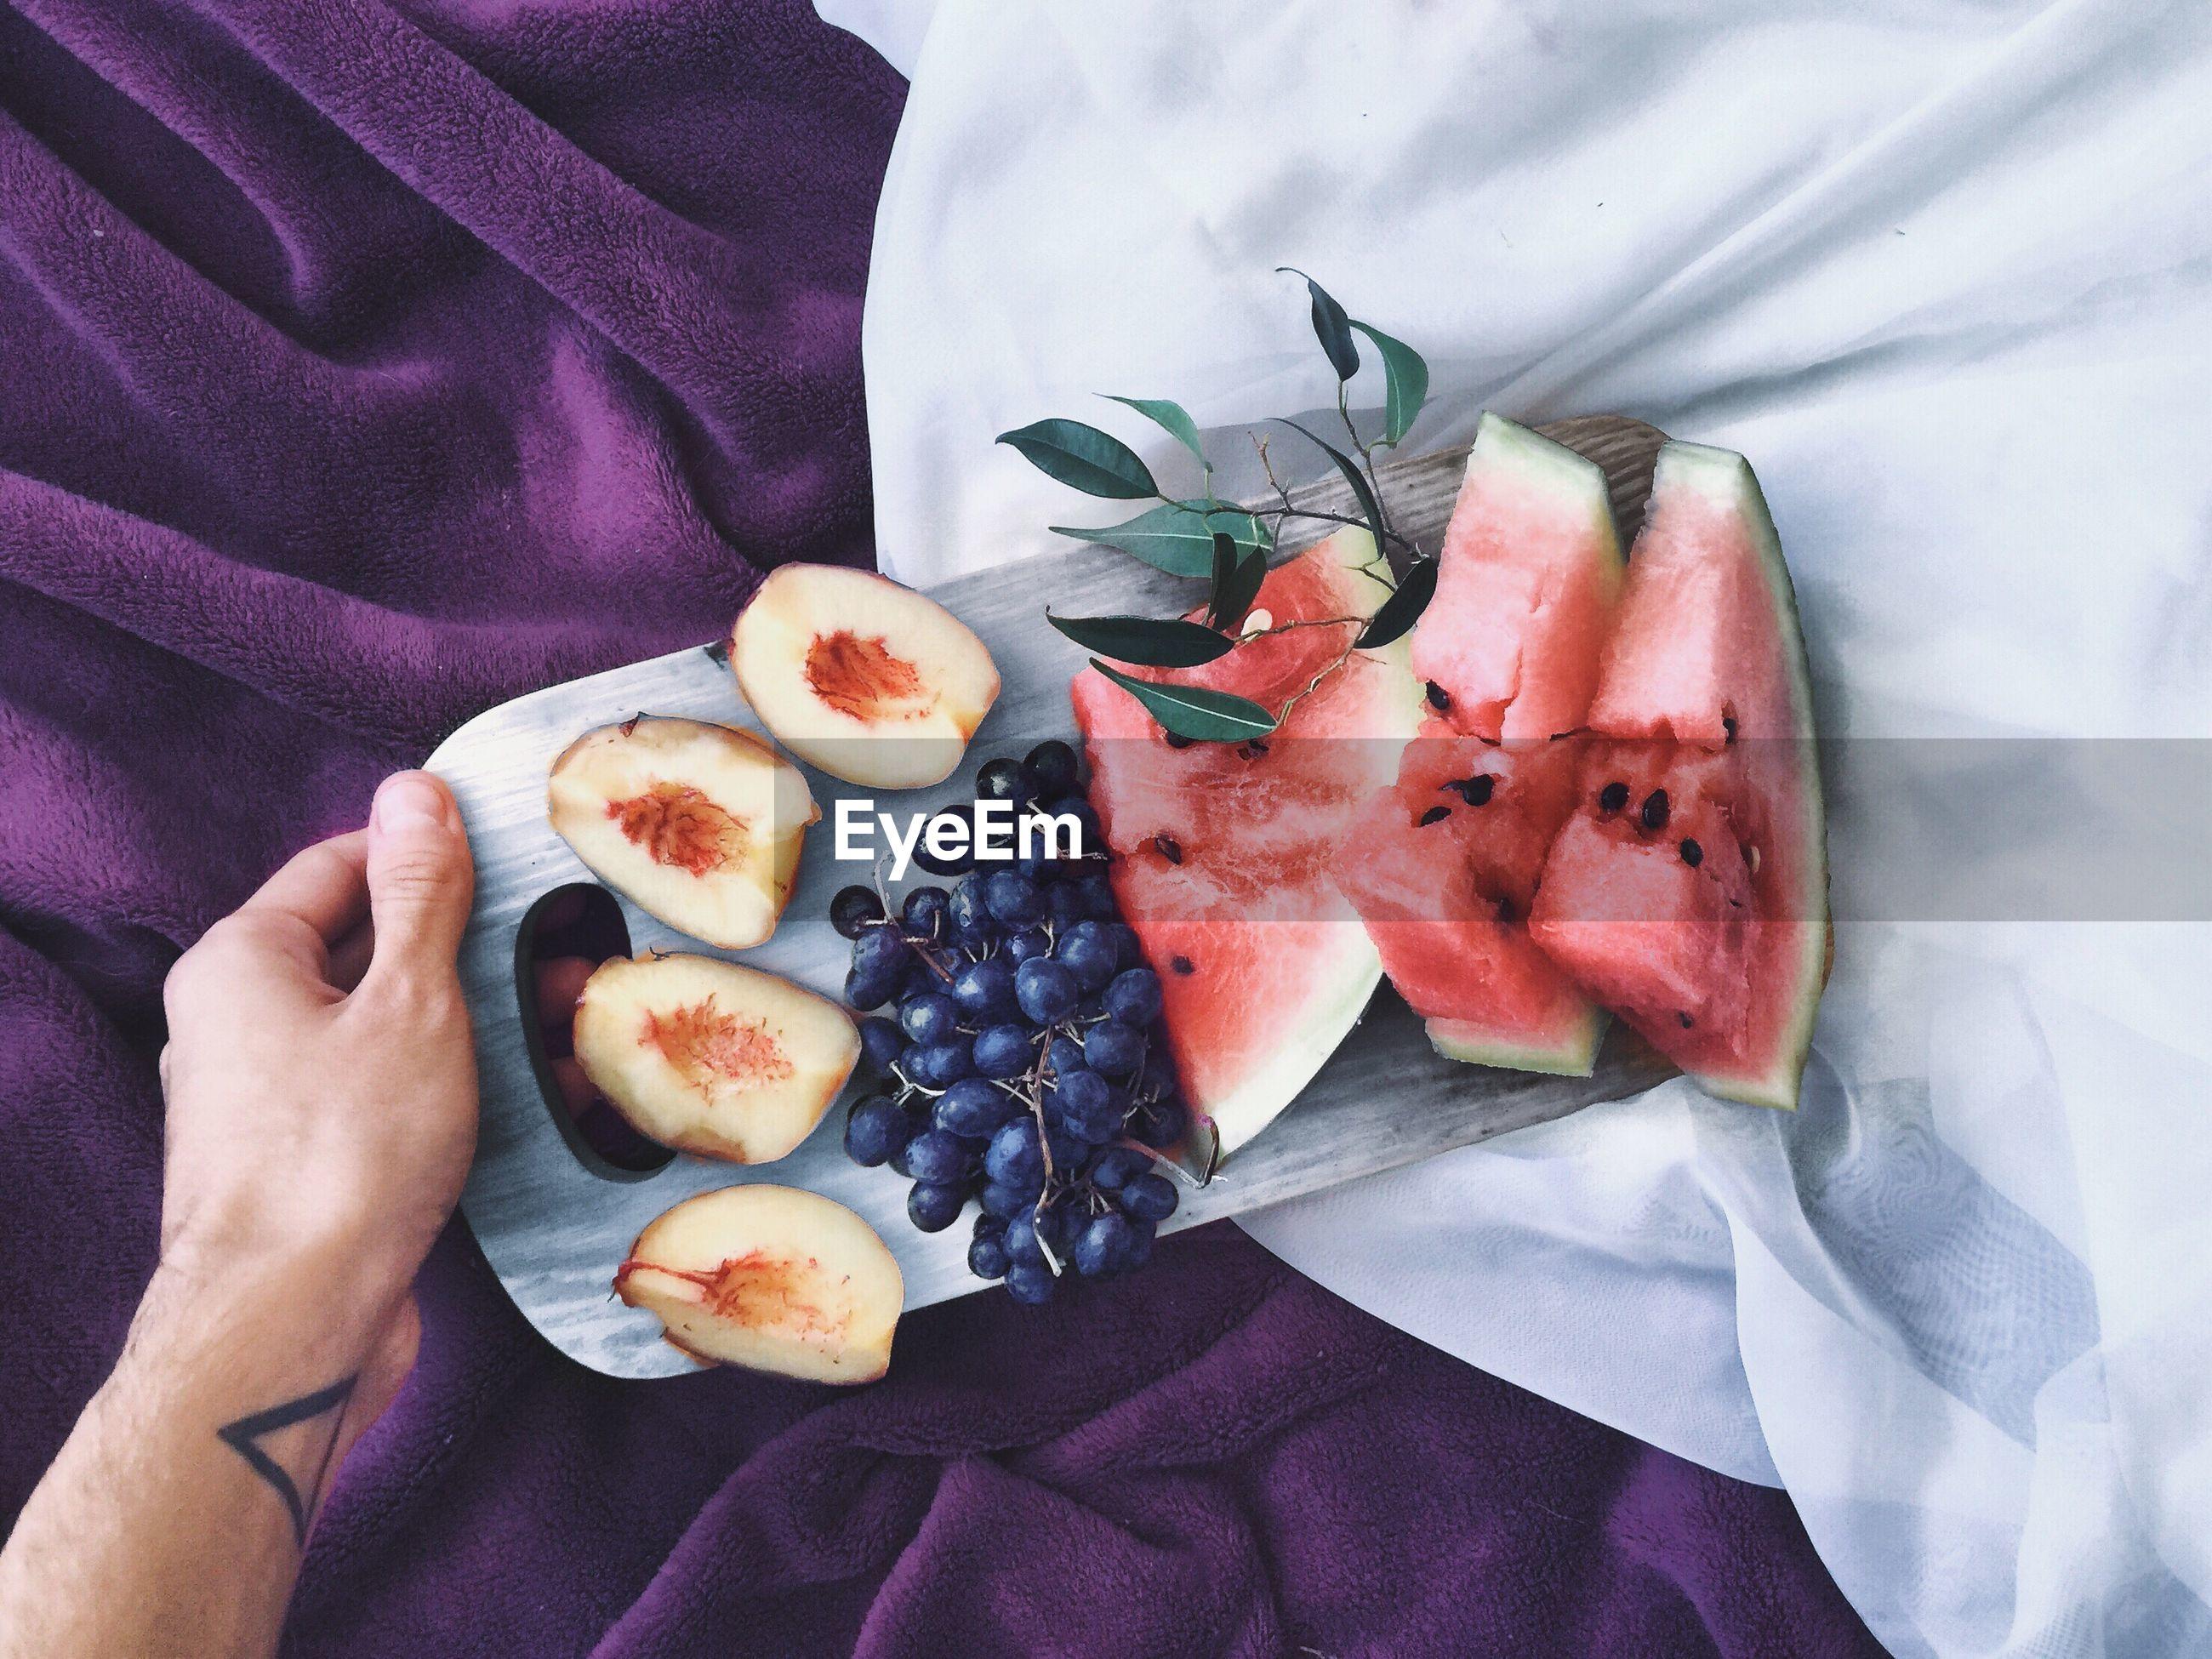 Close-up of hand holding fruit platter